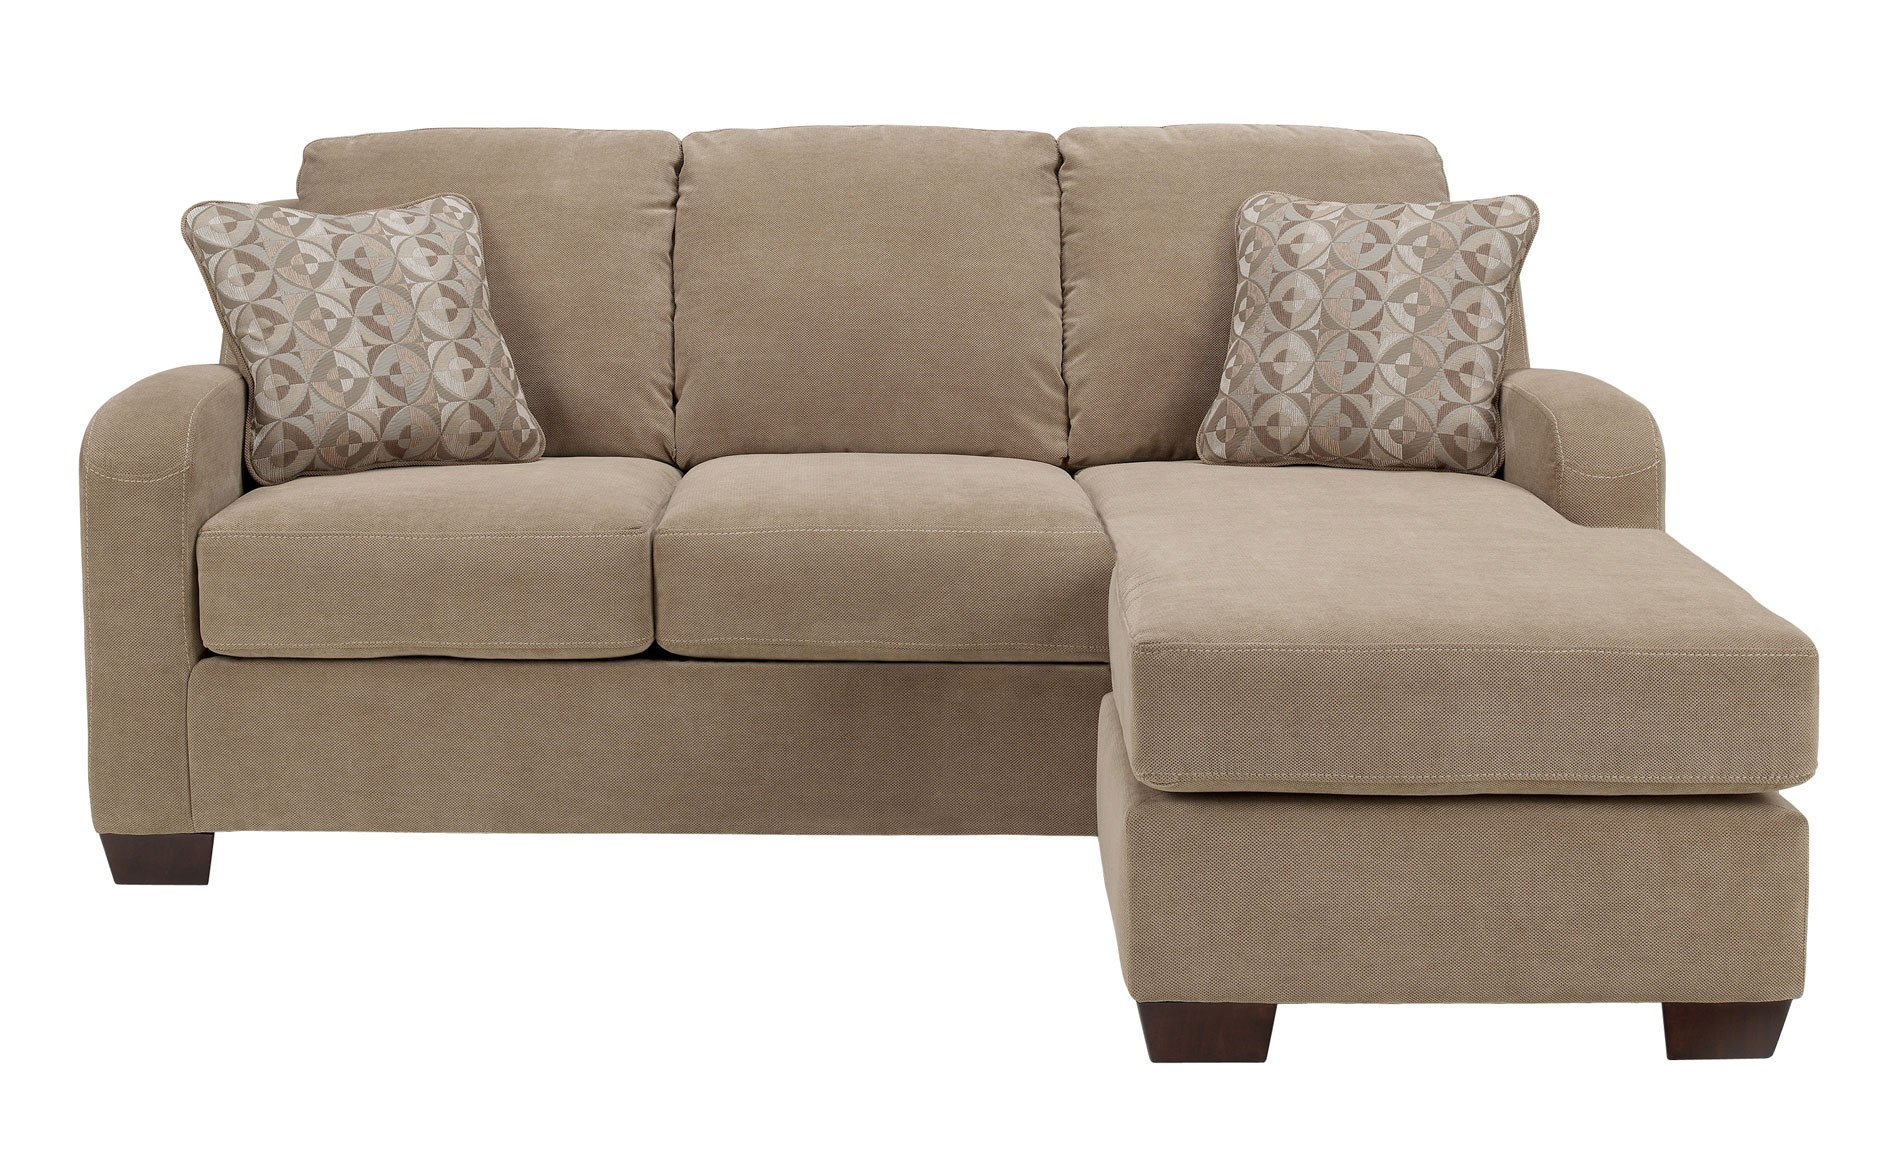 sleeper sofa chaise photo - 8